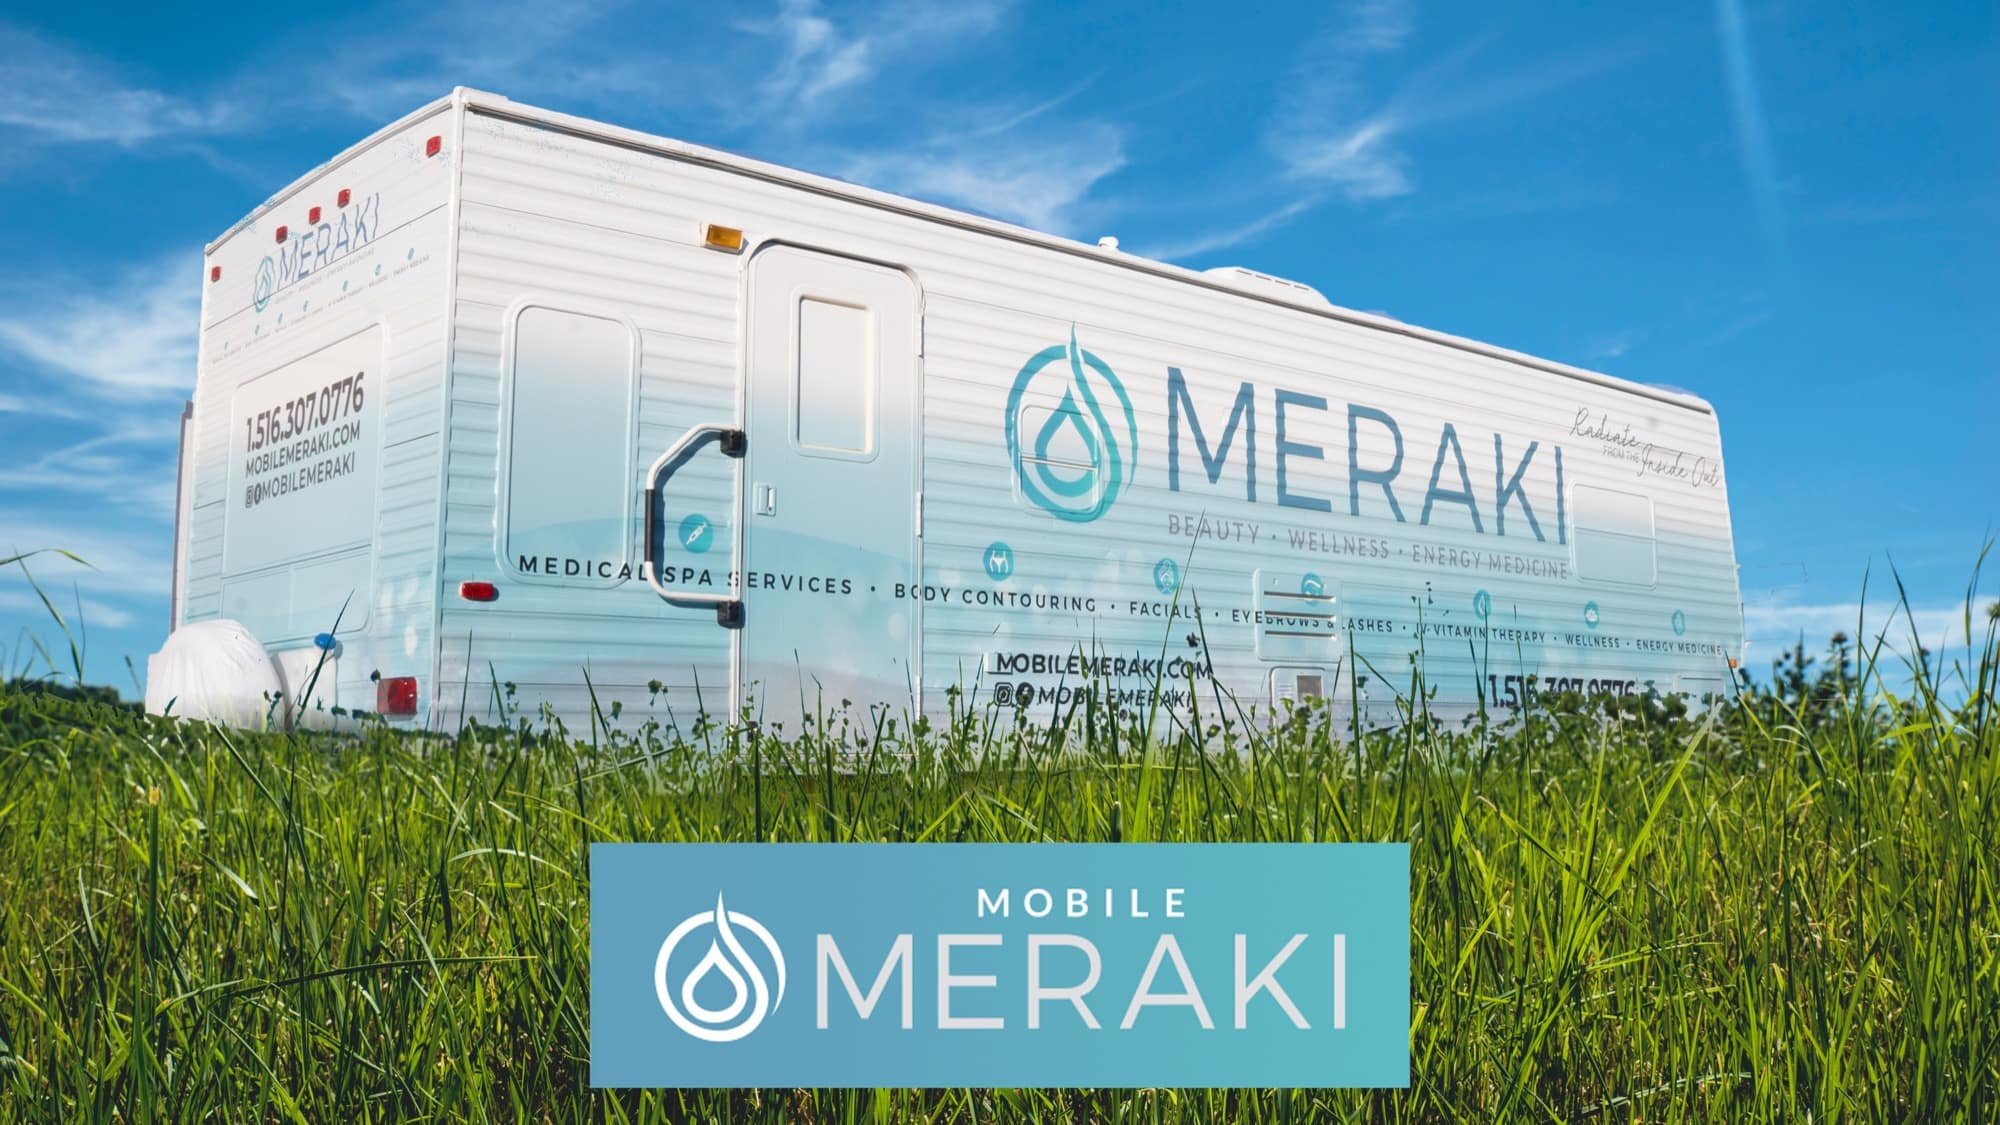 Meraki's come to you mobile coach